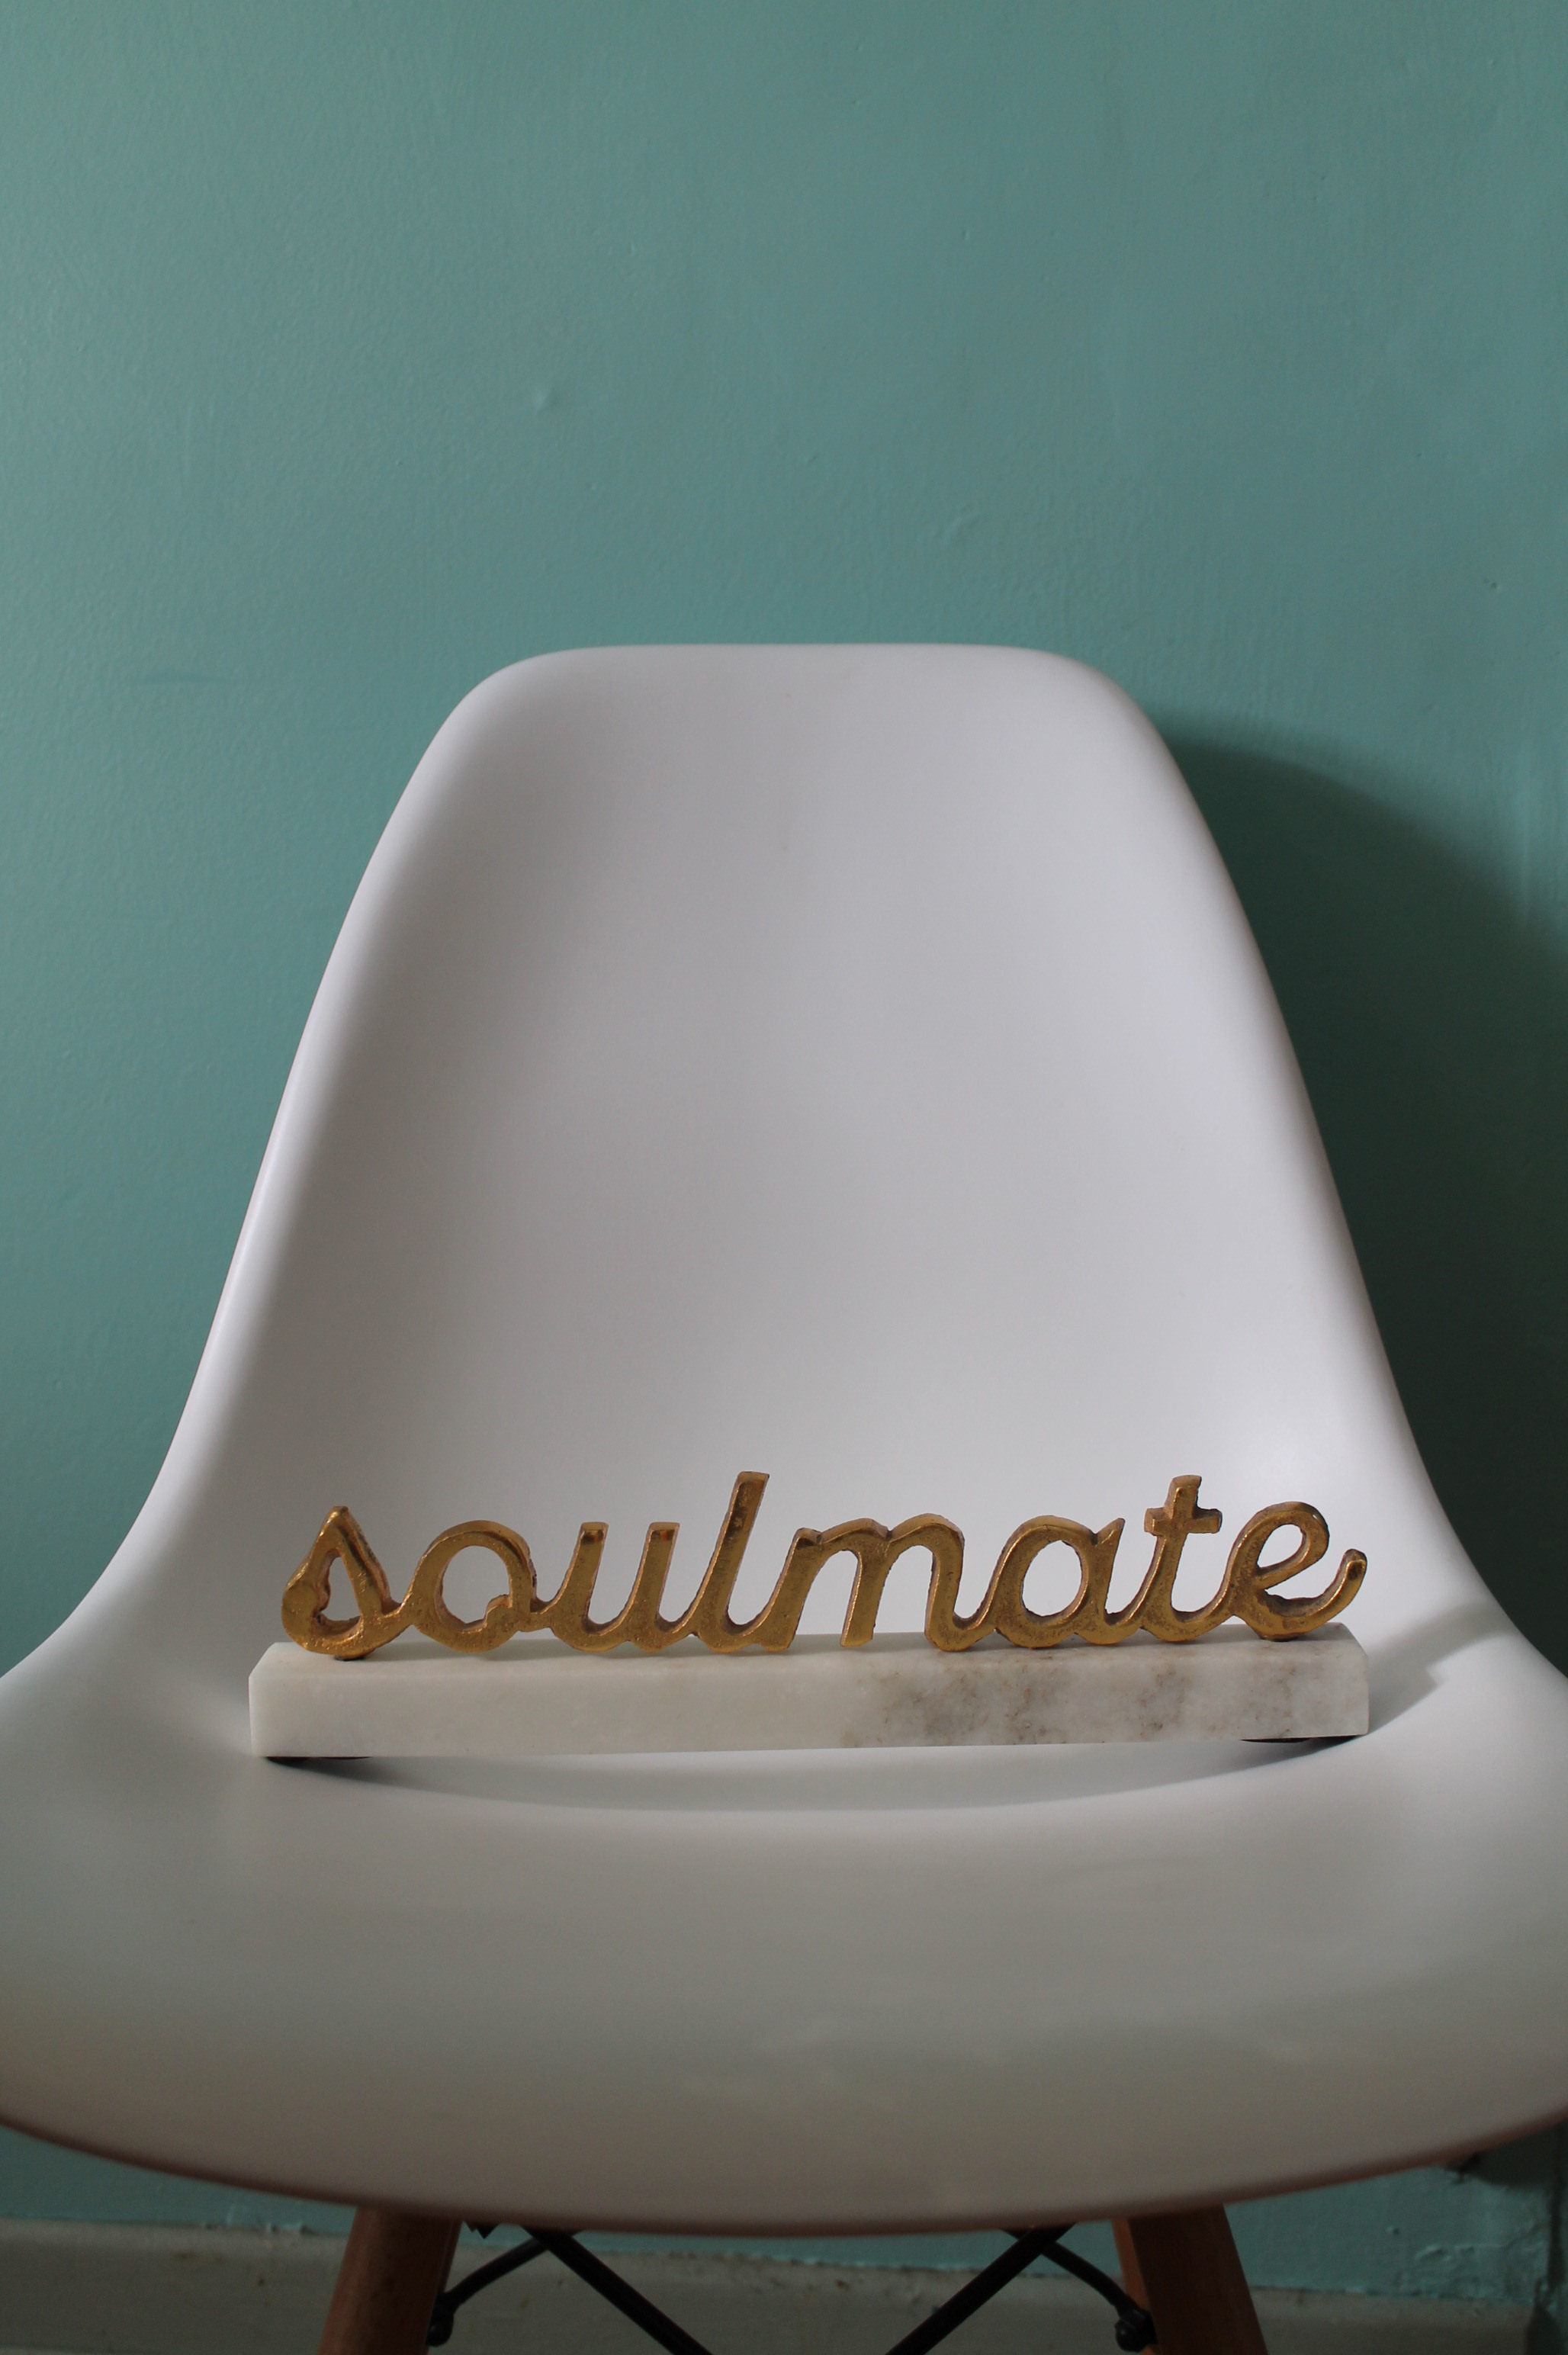 Soulmate10.00 -